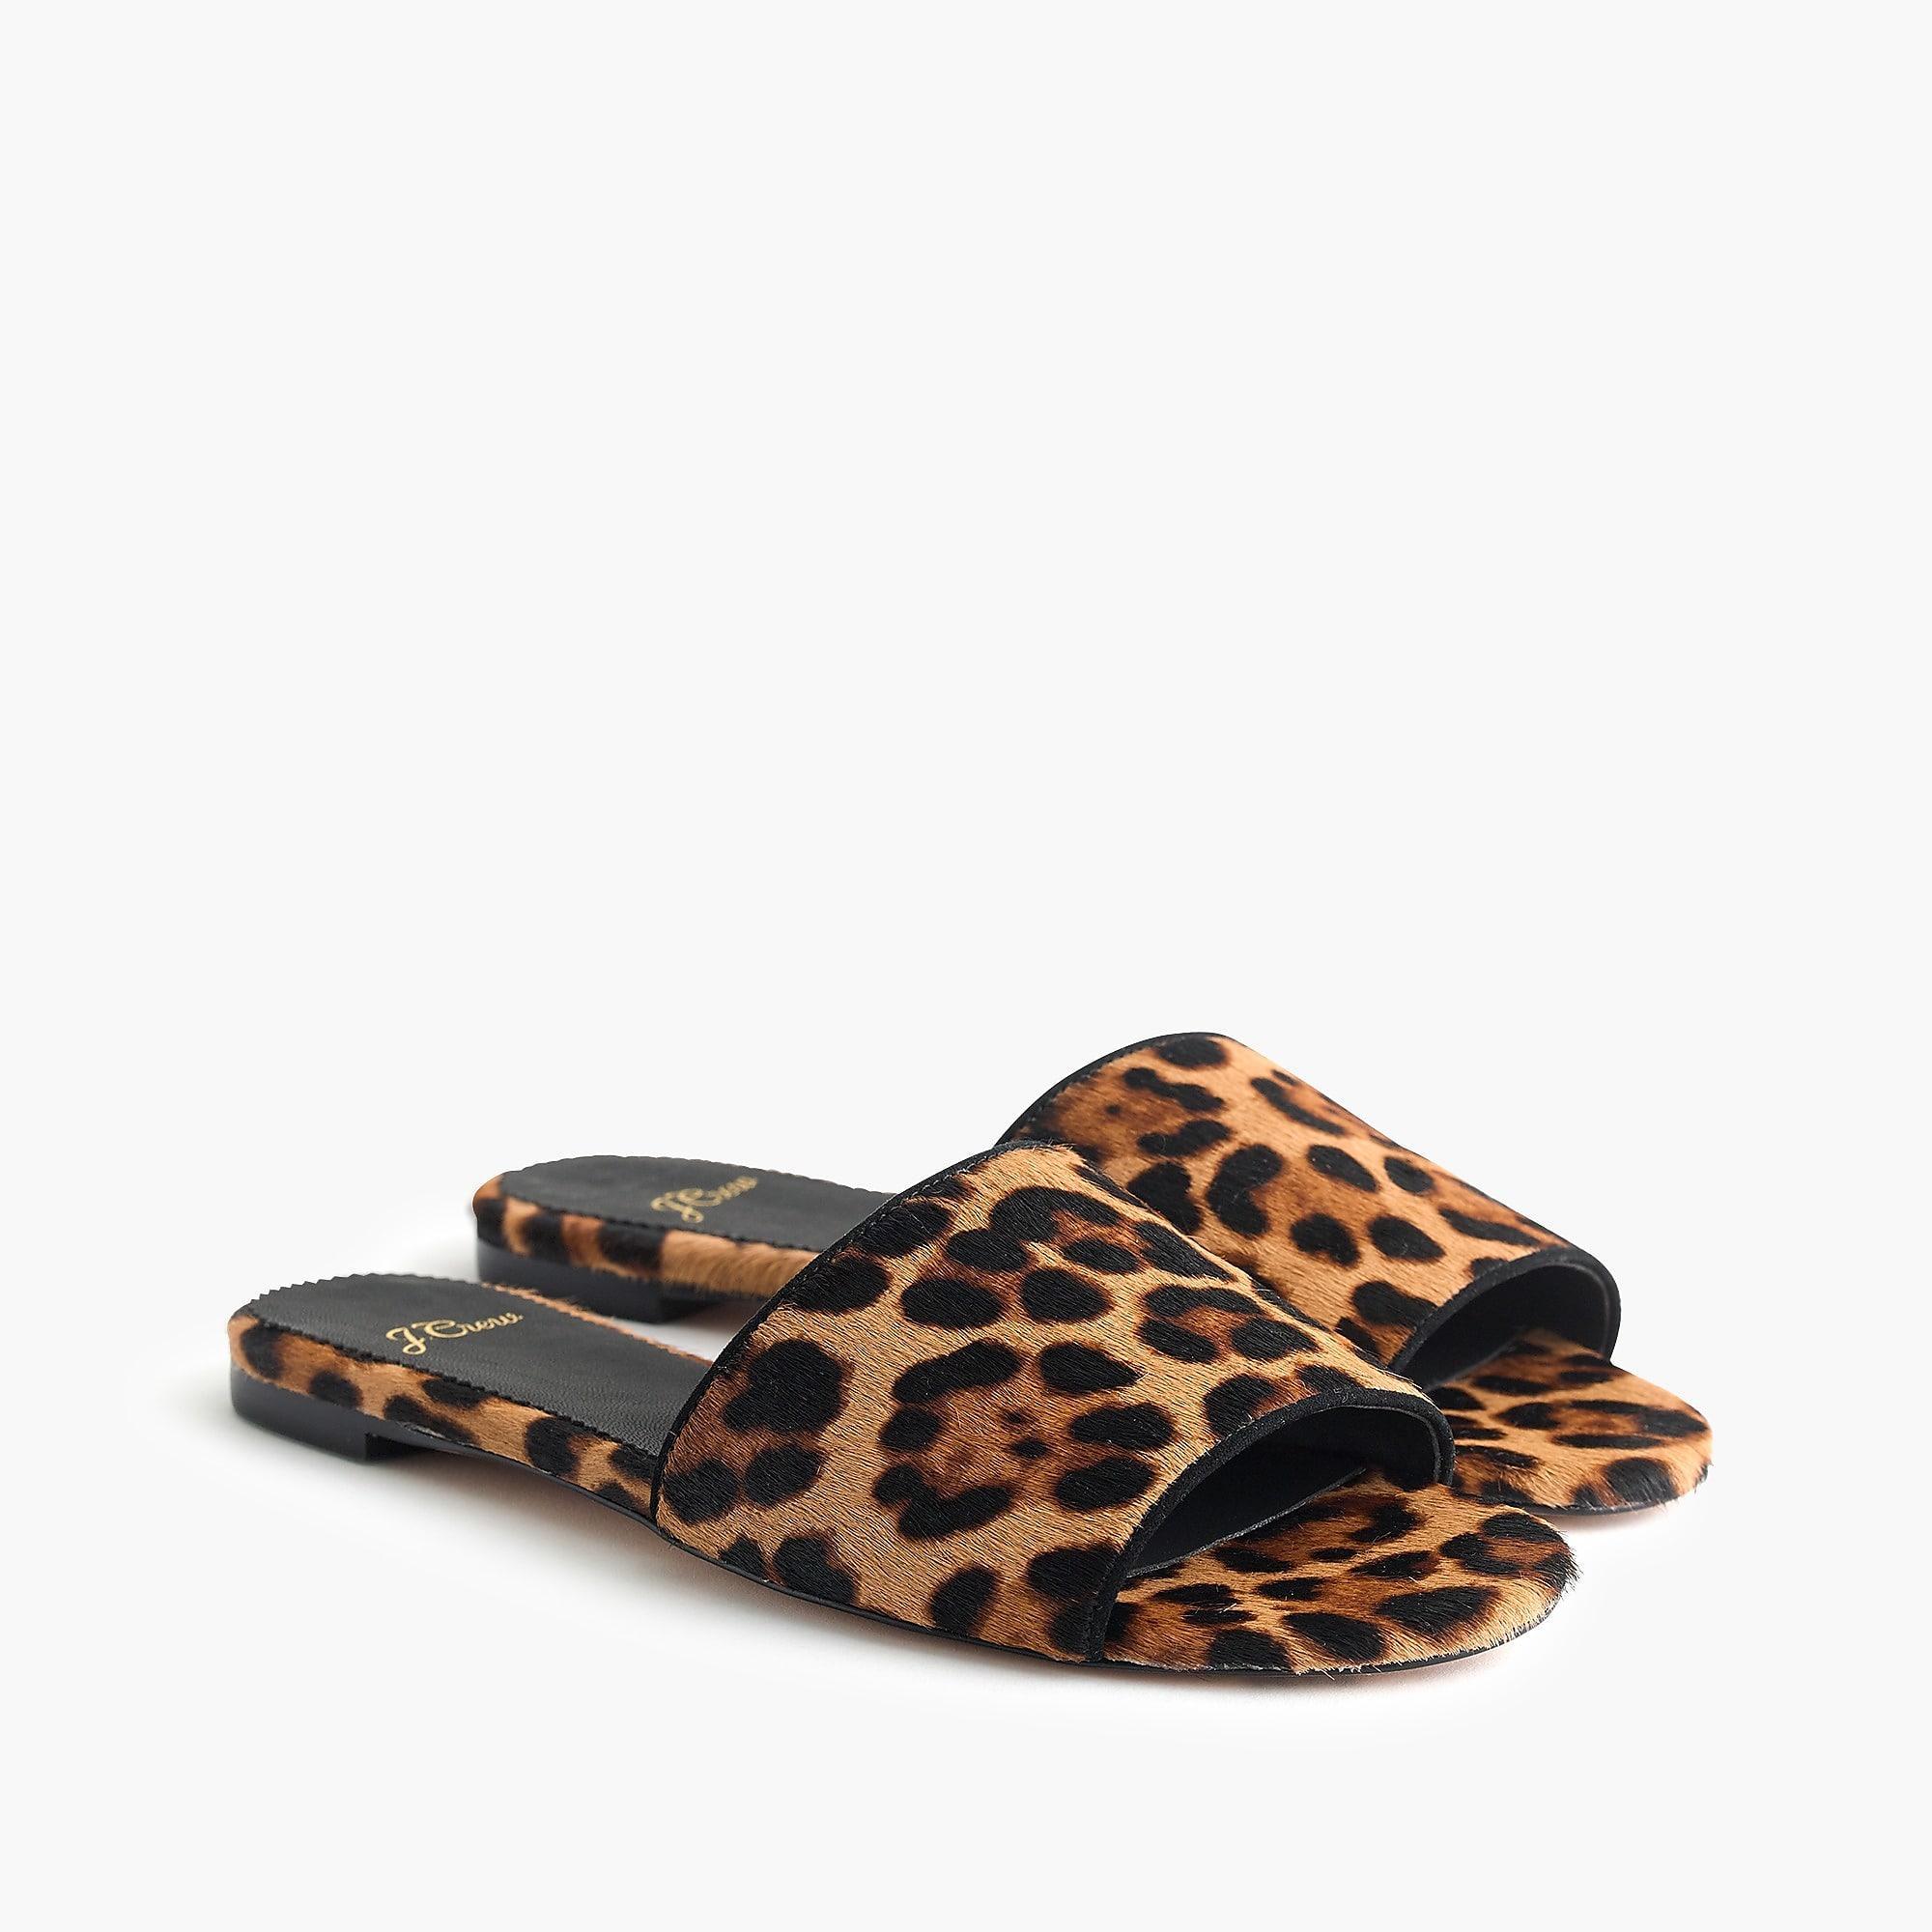 984e6f3d93d J.Crew - Brown Cora Slide Sandals In Leopard Calf Hair - Lyst. View  fullscreen